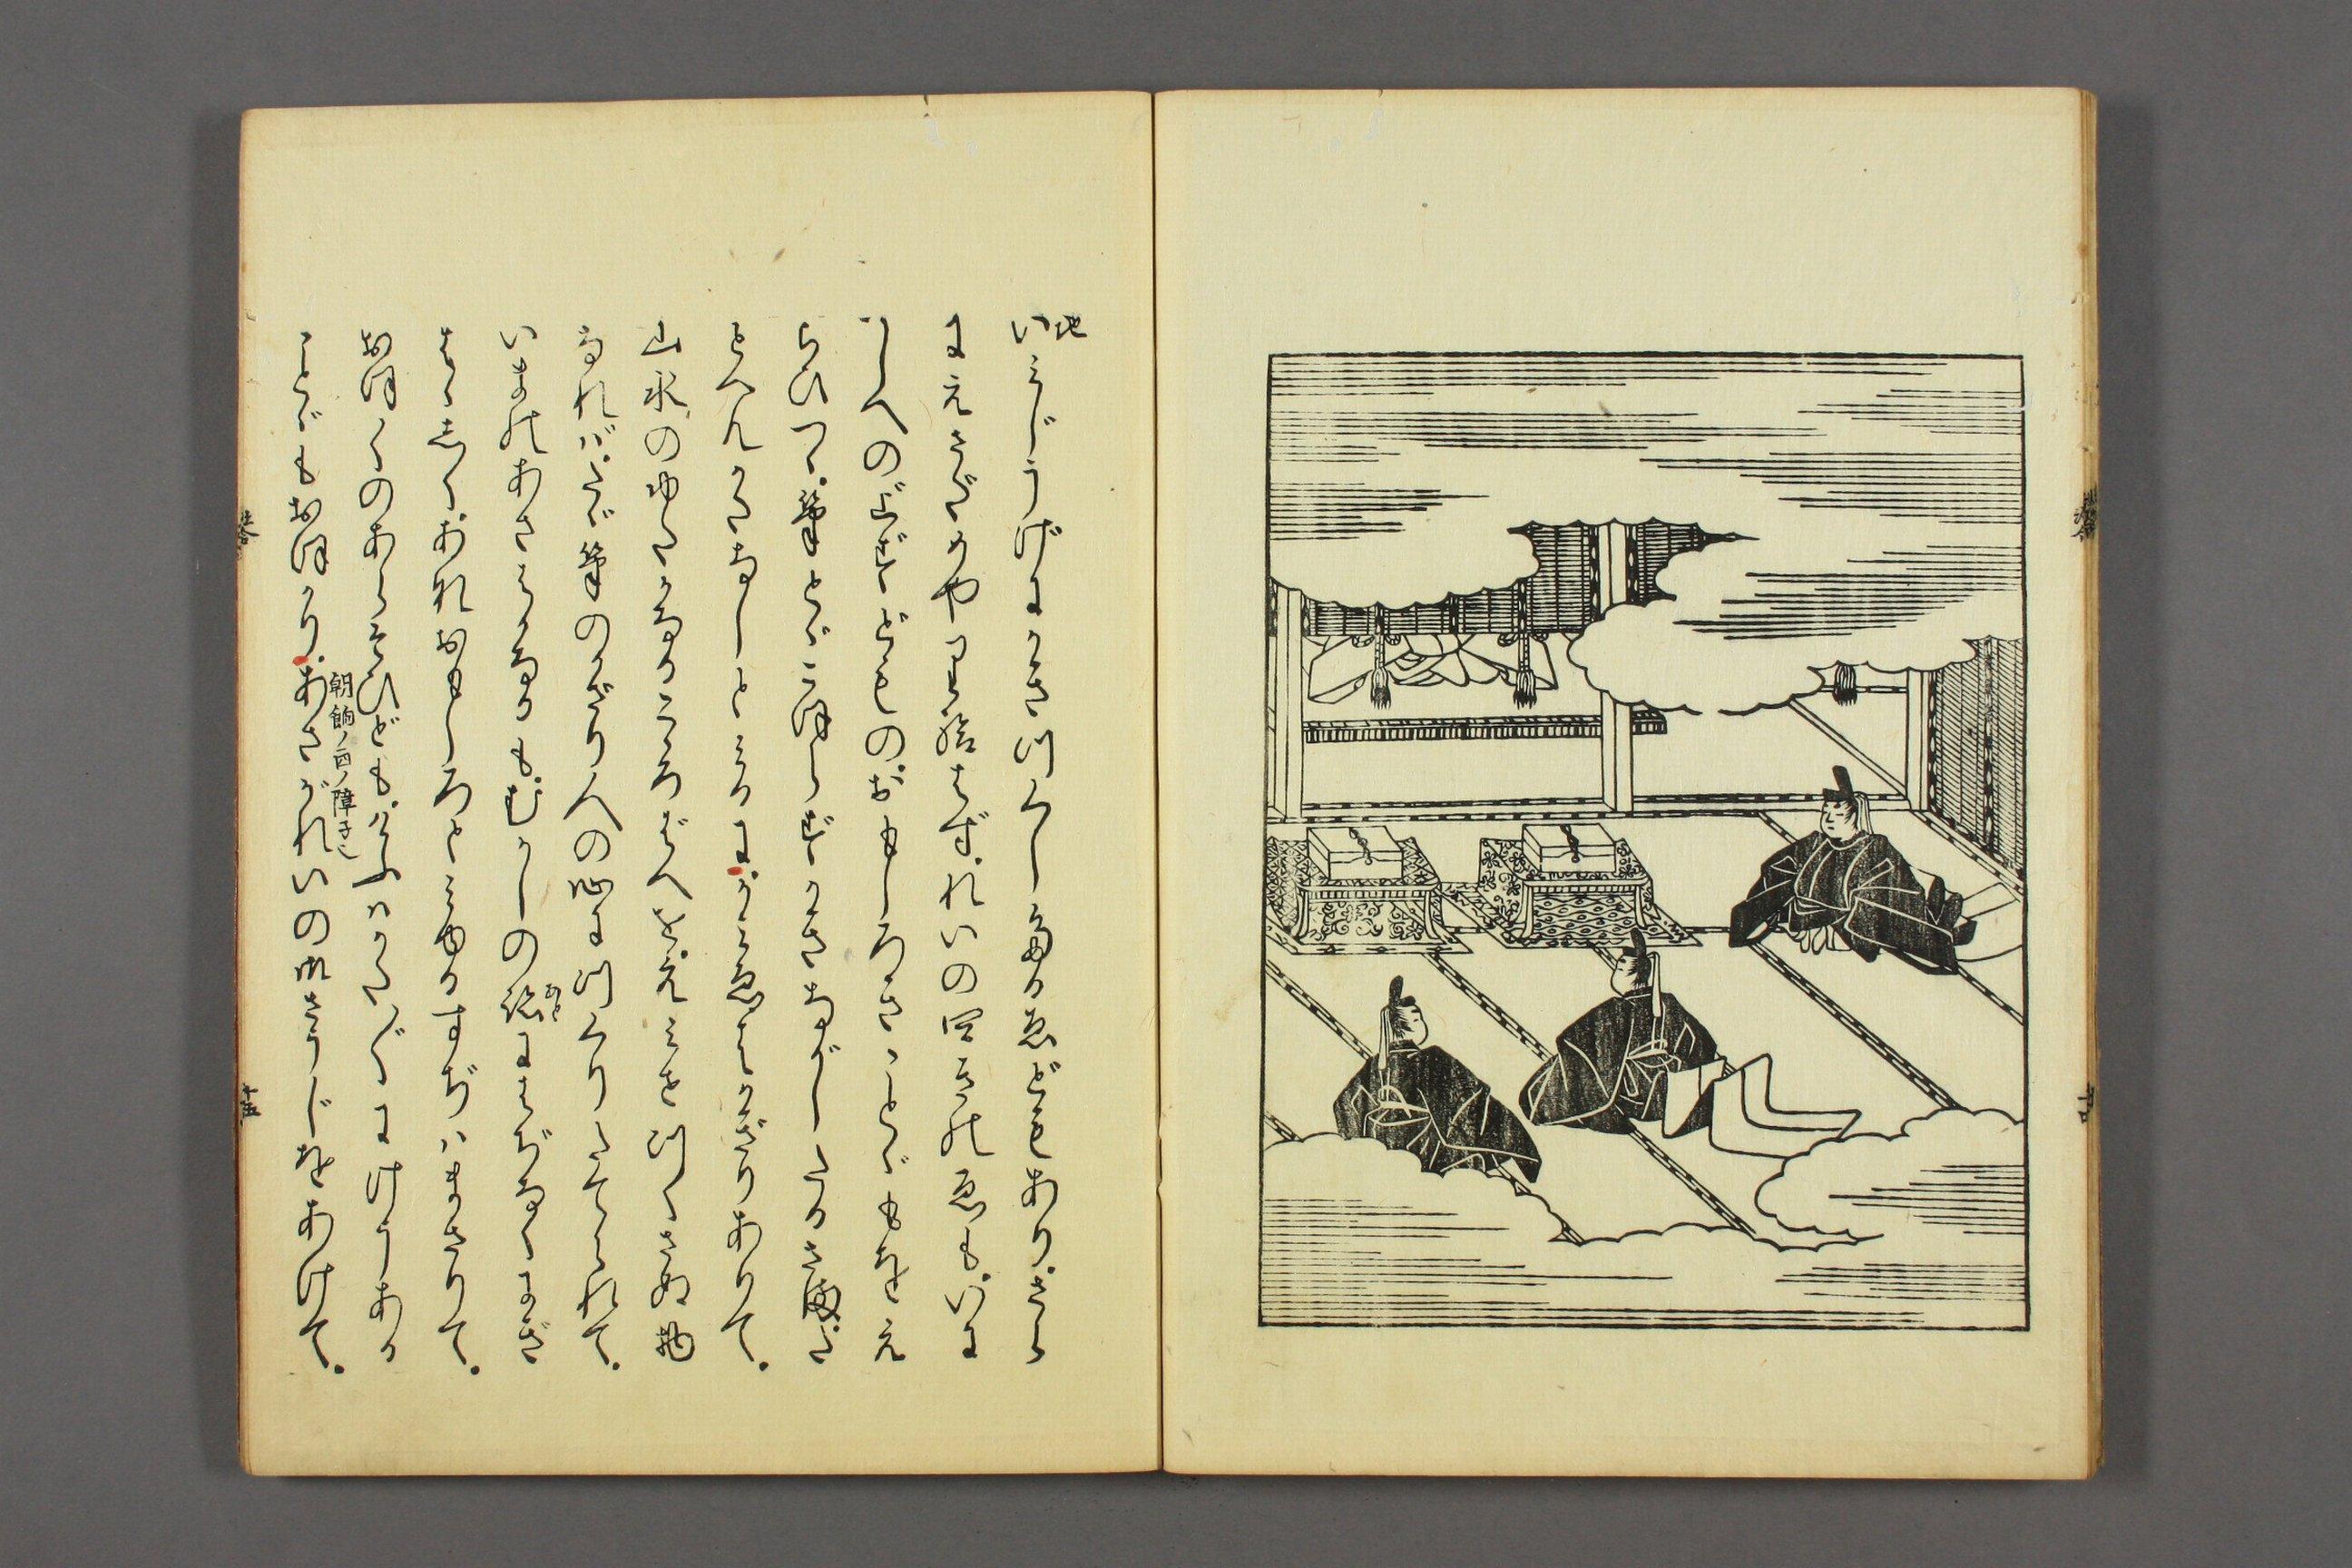 http://archive.wul.waseda.ac.jp/kosho/bunko30/bunko30_a0007/bunko30_a0007_0017/bunko30_a0007_0017_p0016.jpg